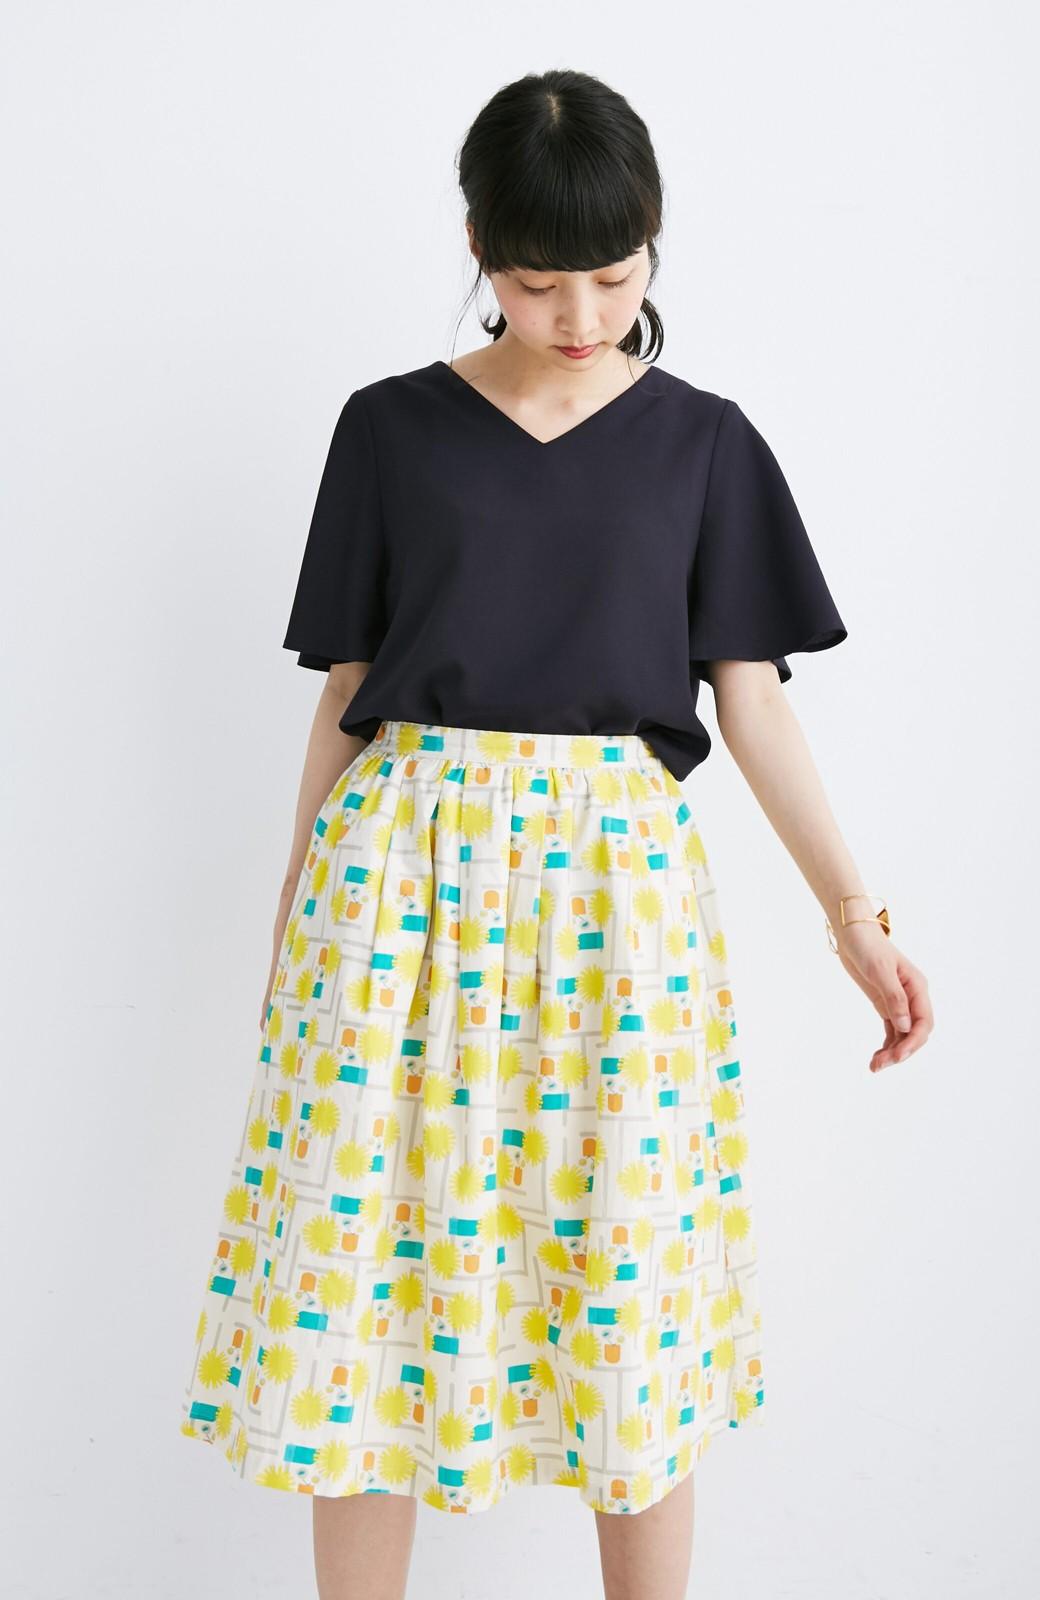 haco! ユニカラート 漆嶌知子 たんぽぽ スカート <イエロー>の商品写真6